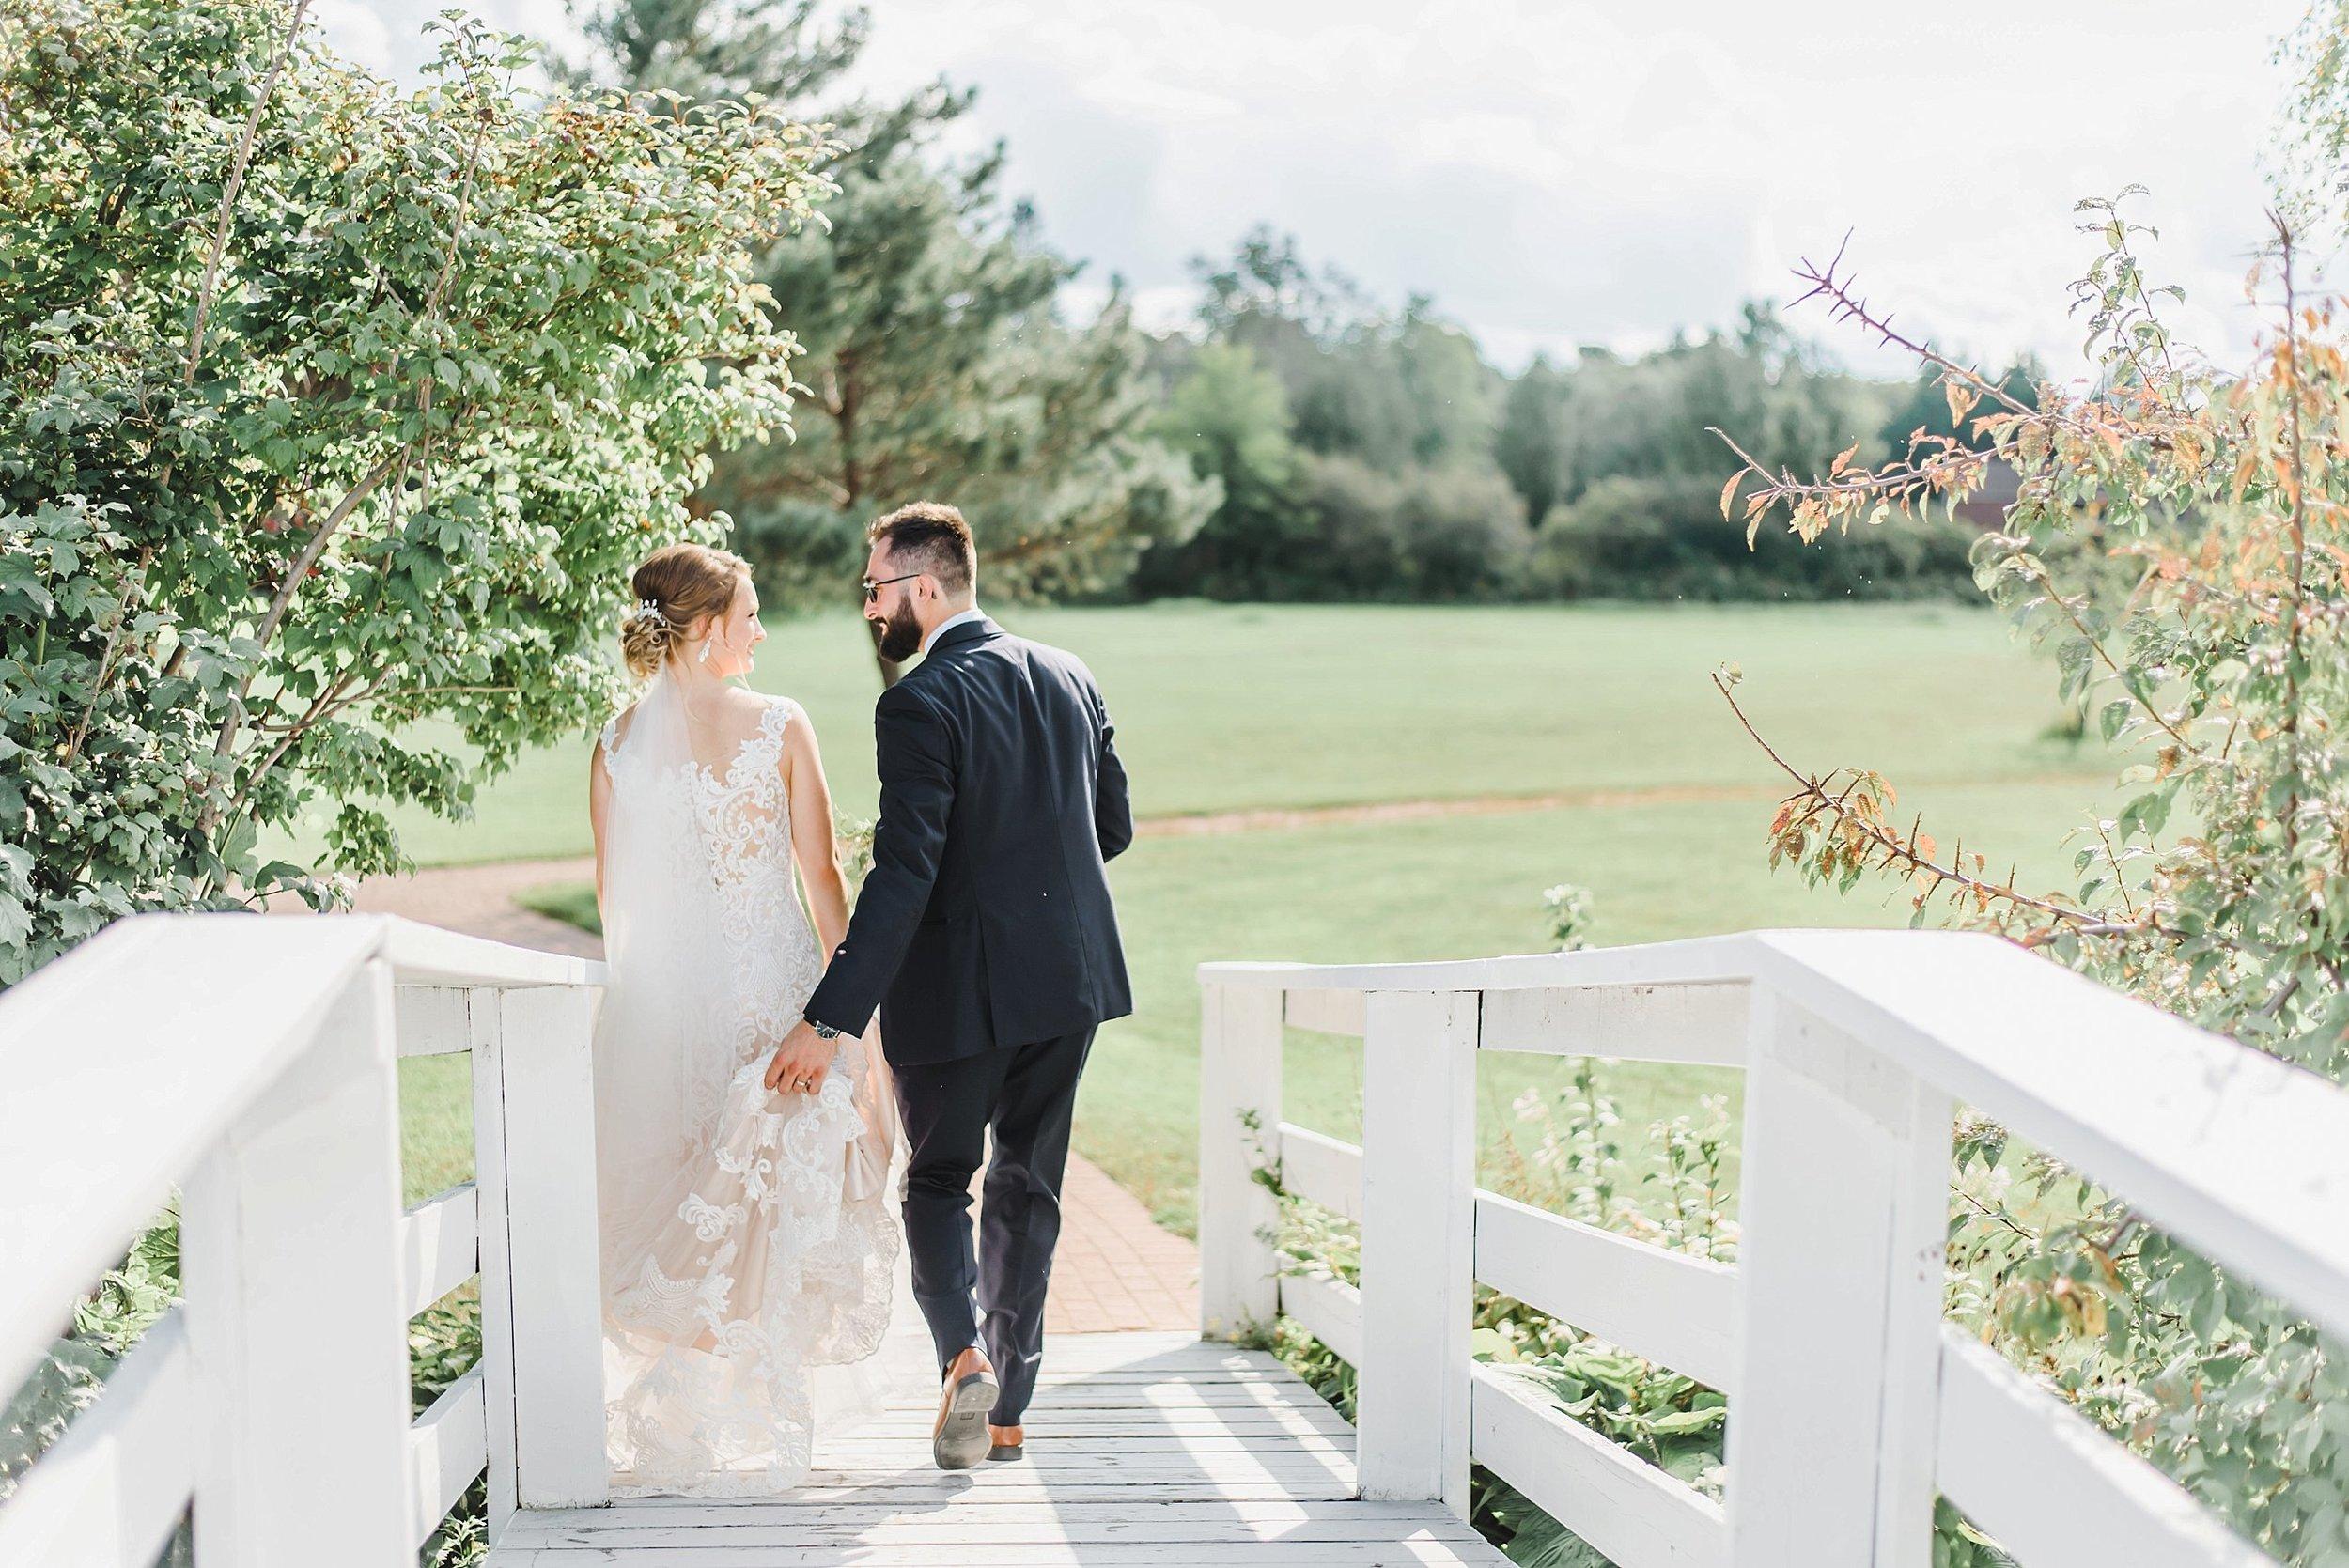 light airy indie fine art ottawa wedding photographer | Ali and Batoul Photography_1301.jpg